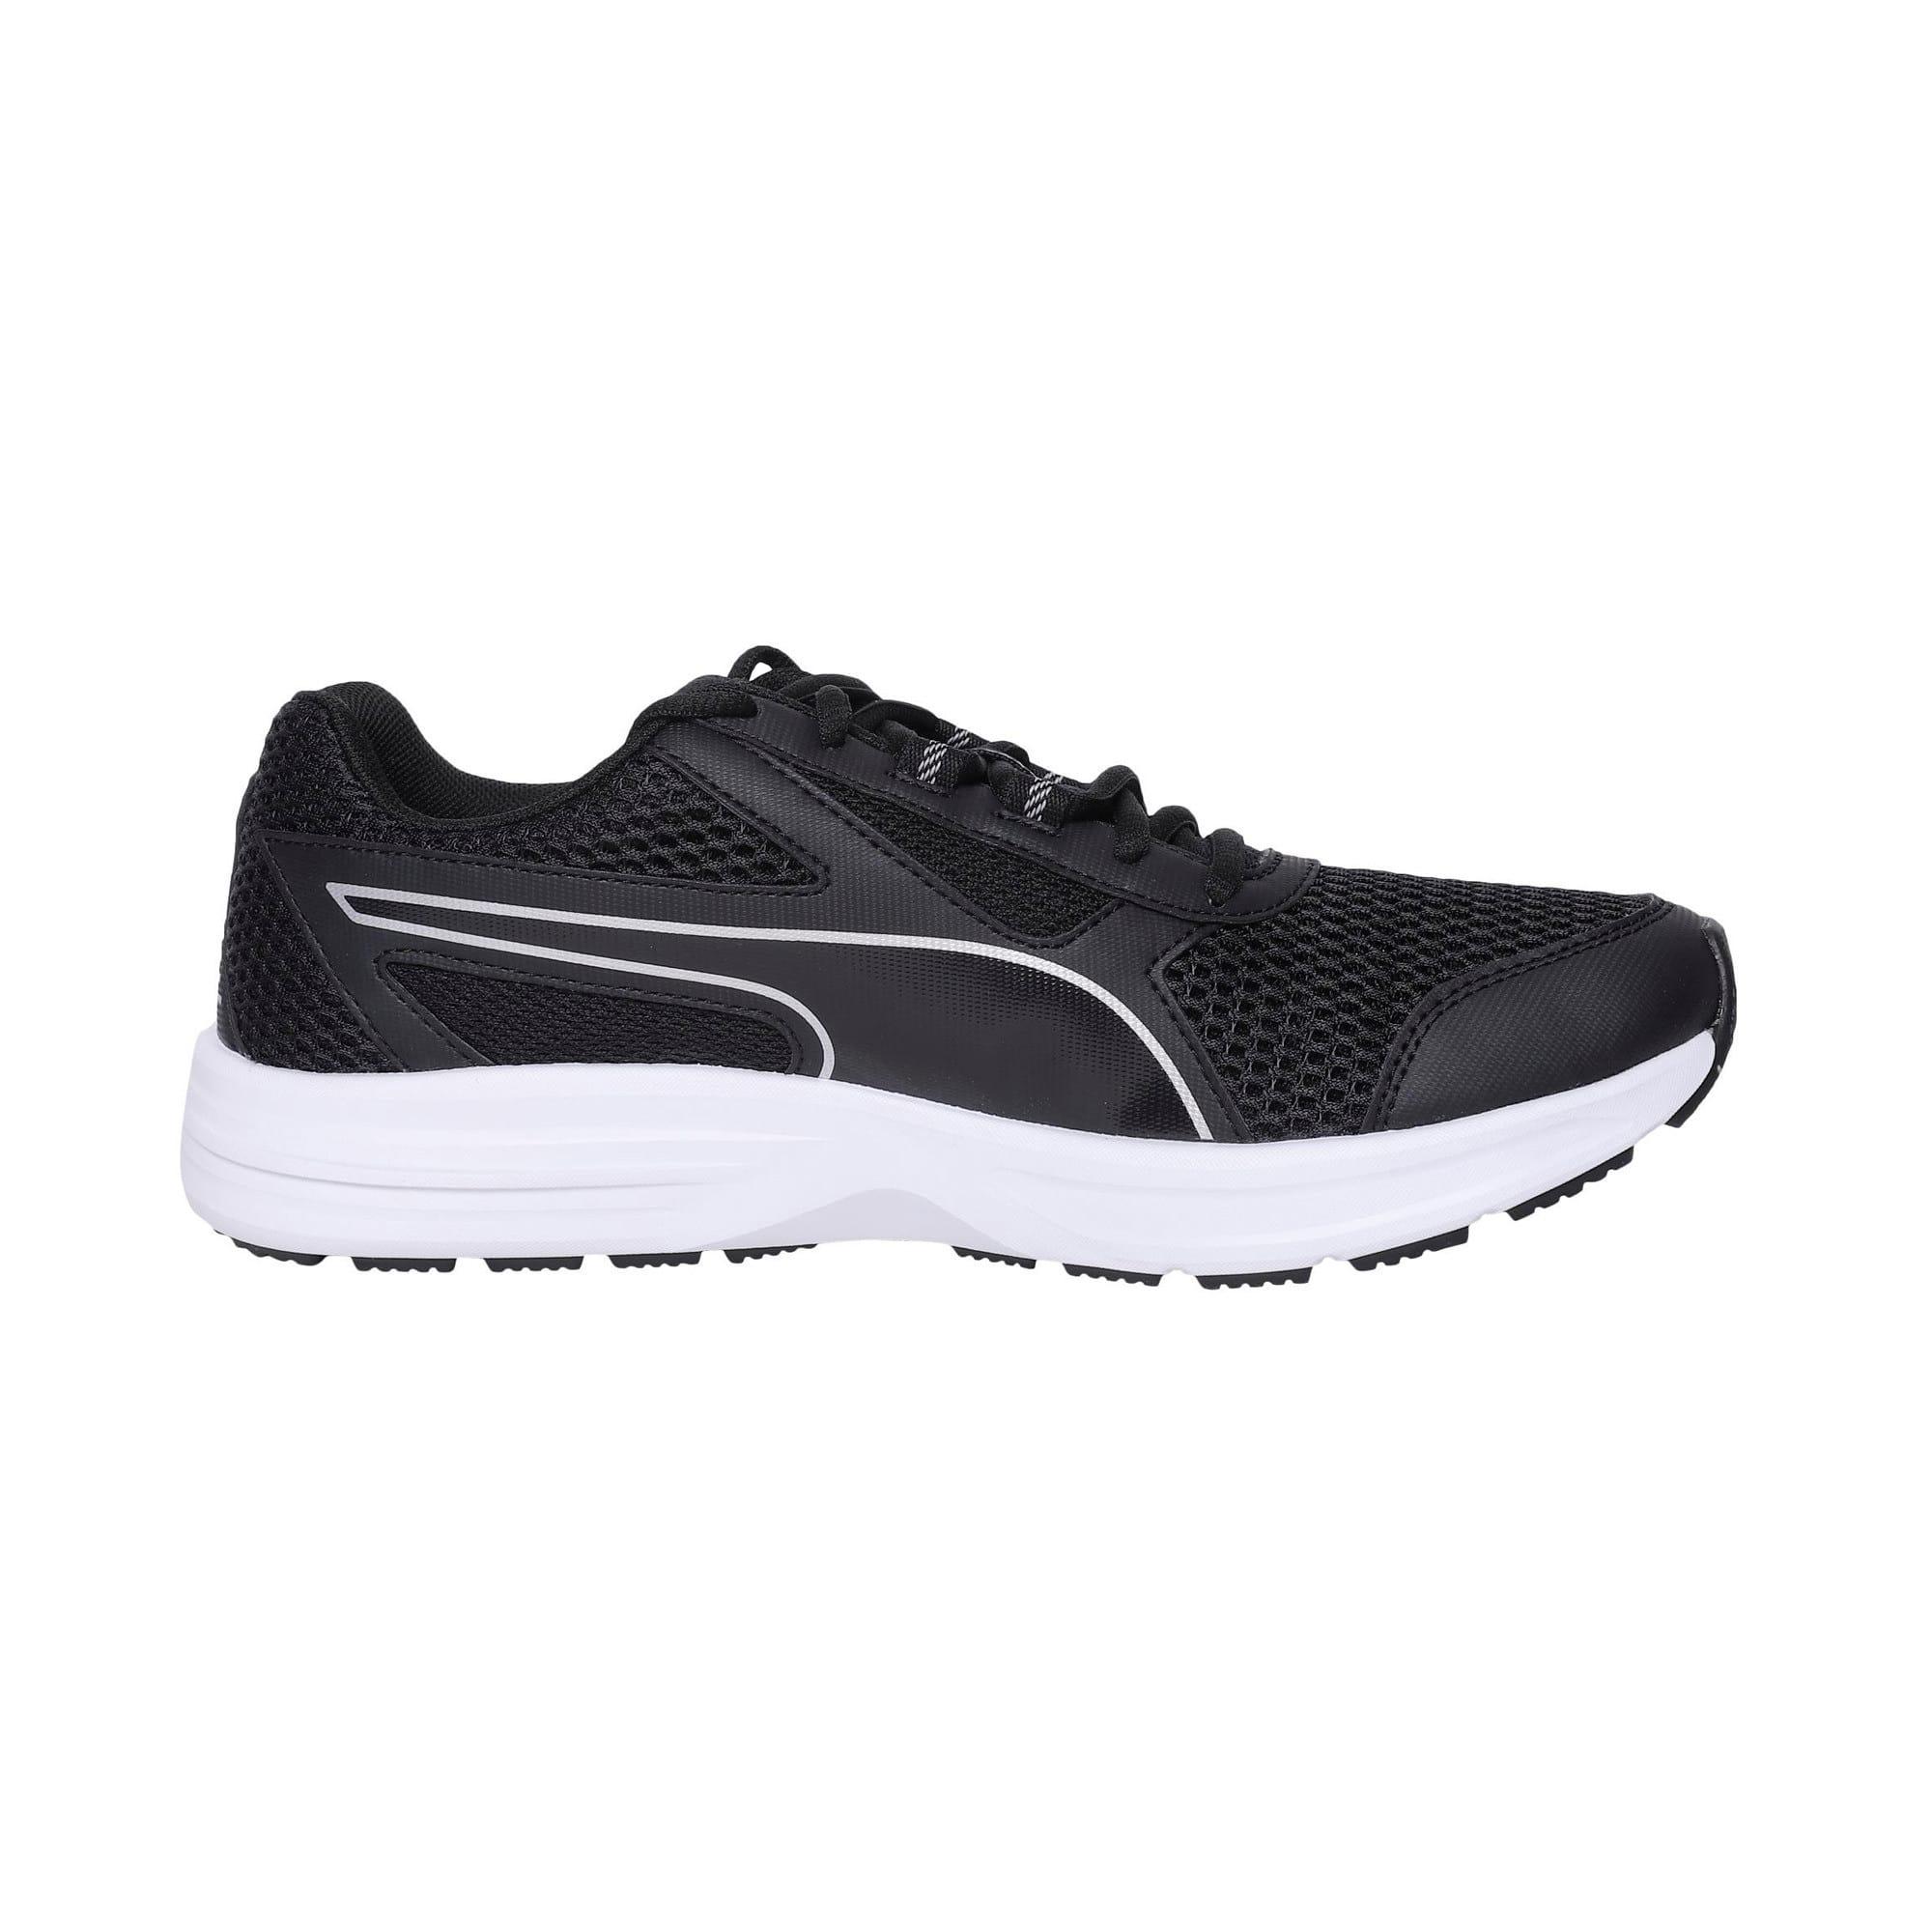 Thumbnail 5 of Essential Runner Men's Running Shoes, Puma Black-Puma Silver, medium-IND